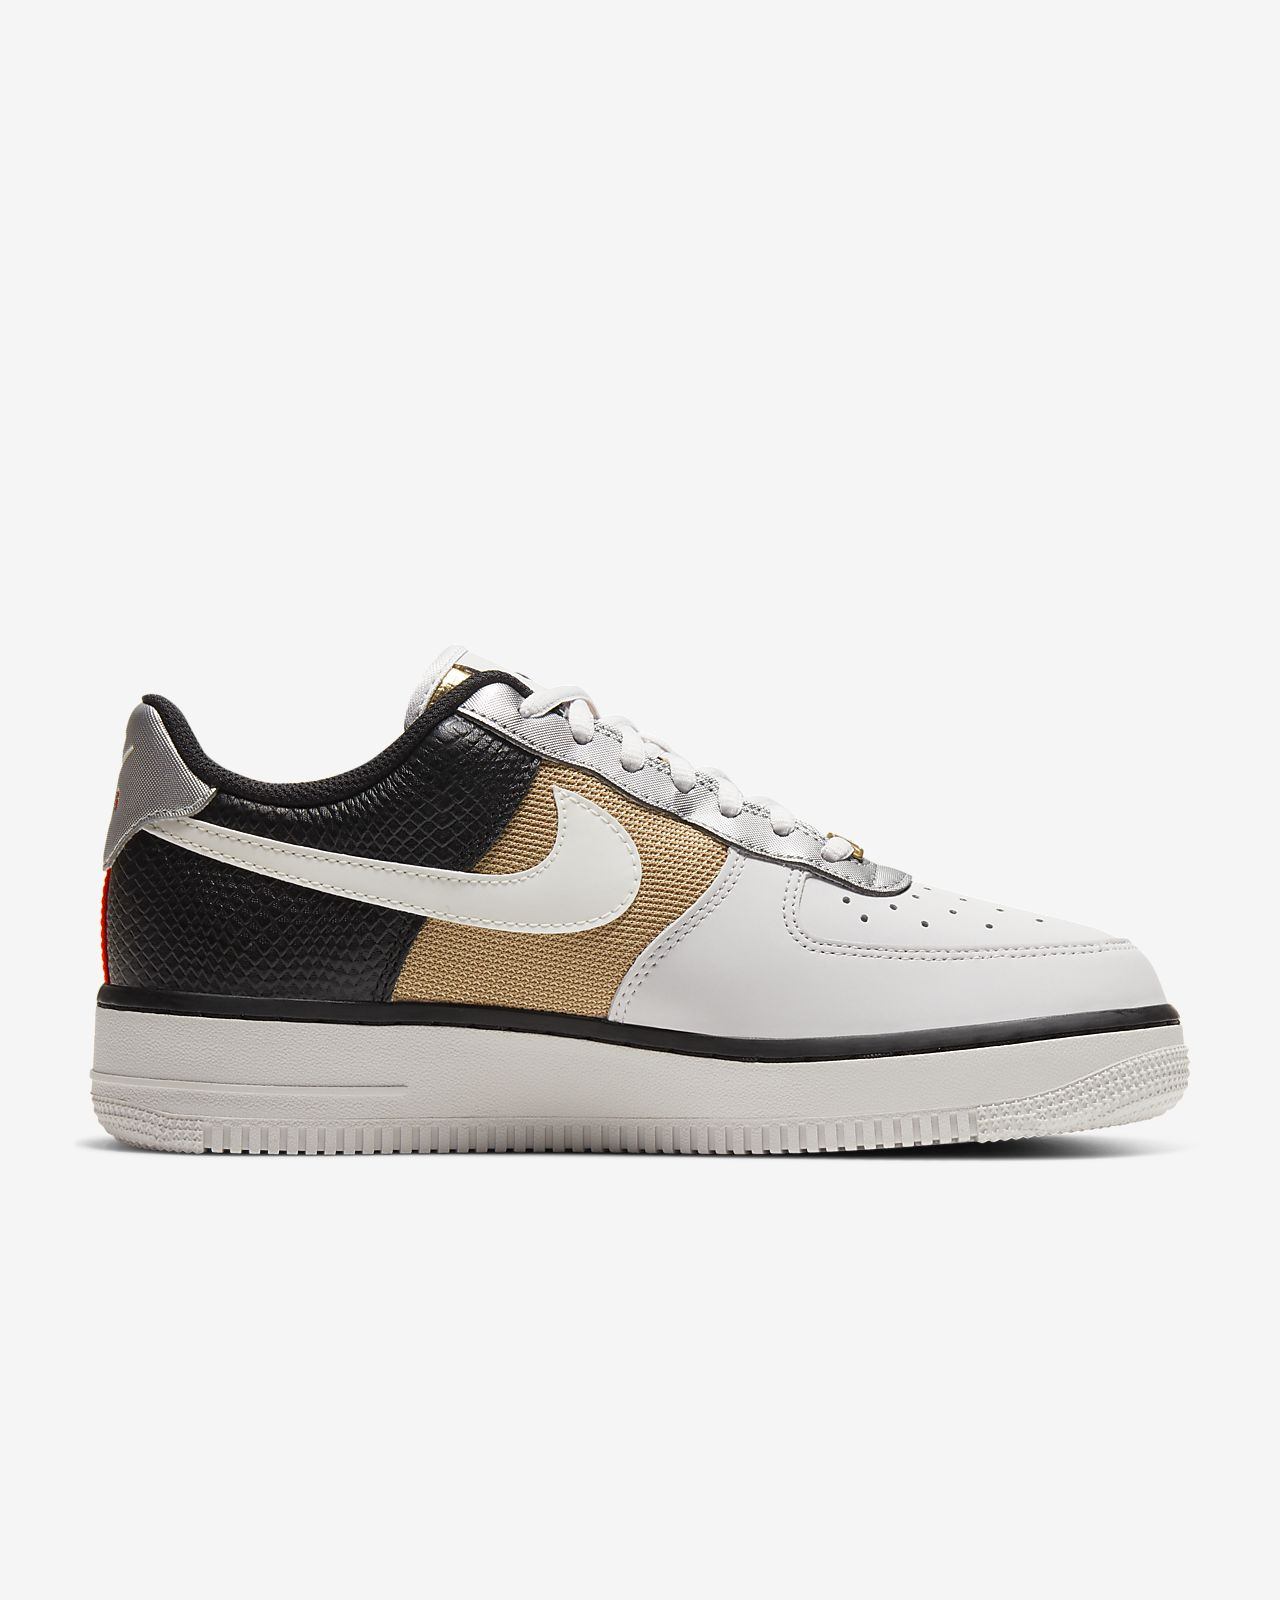 Nike Air Force 1 '07 Metallic Vast Grey Donna